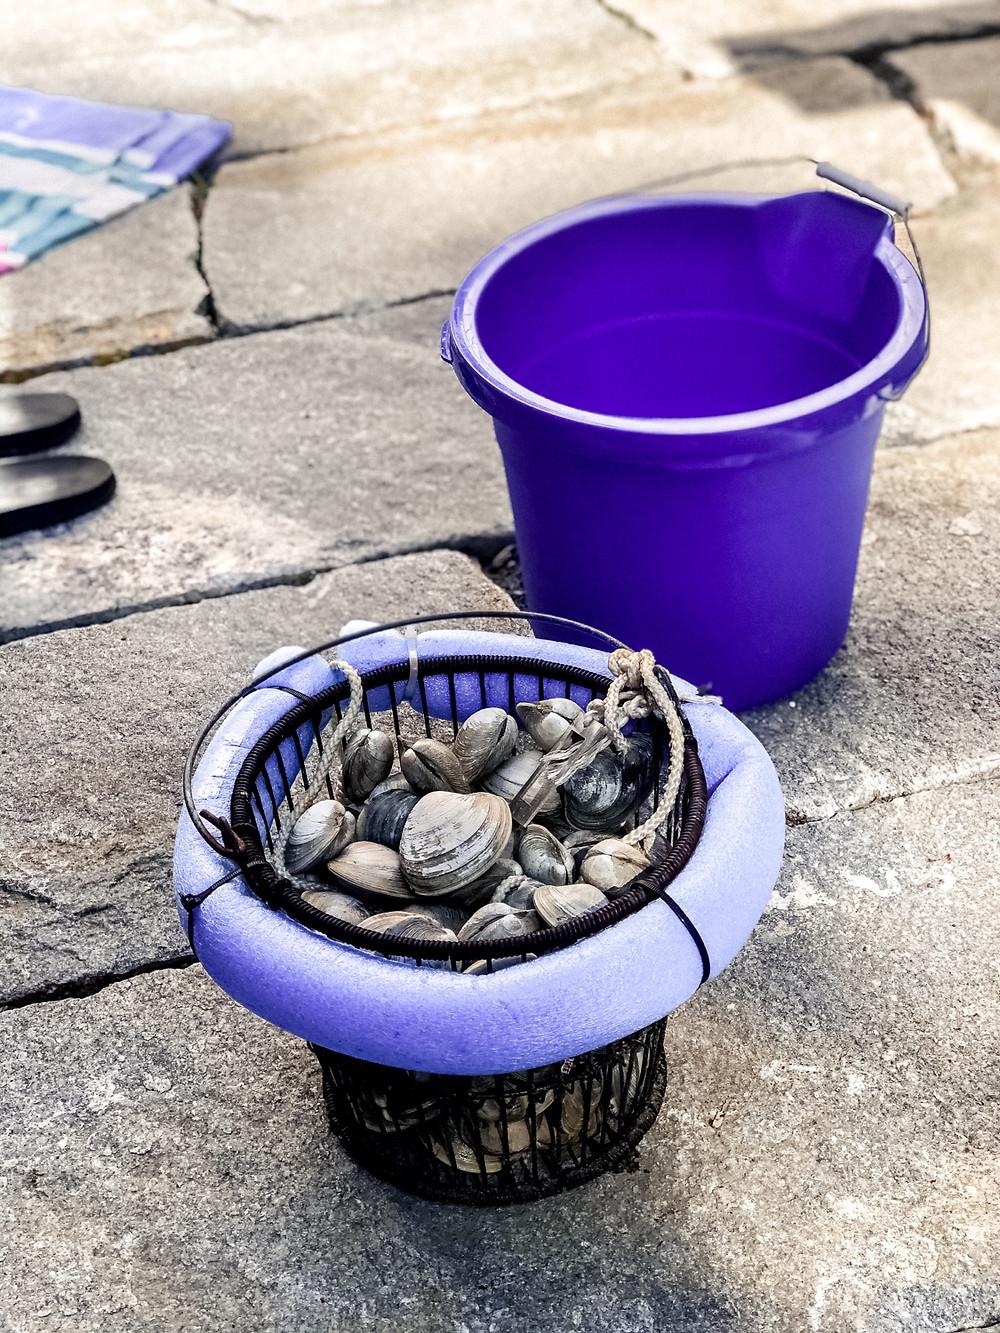 blue bucket full of fresh clams